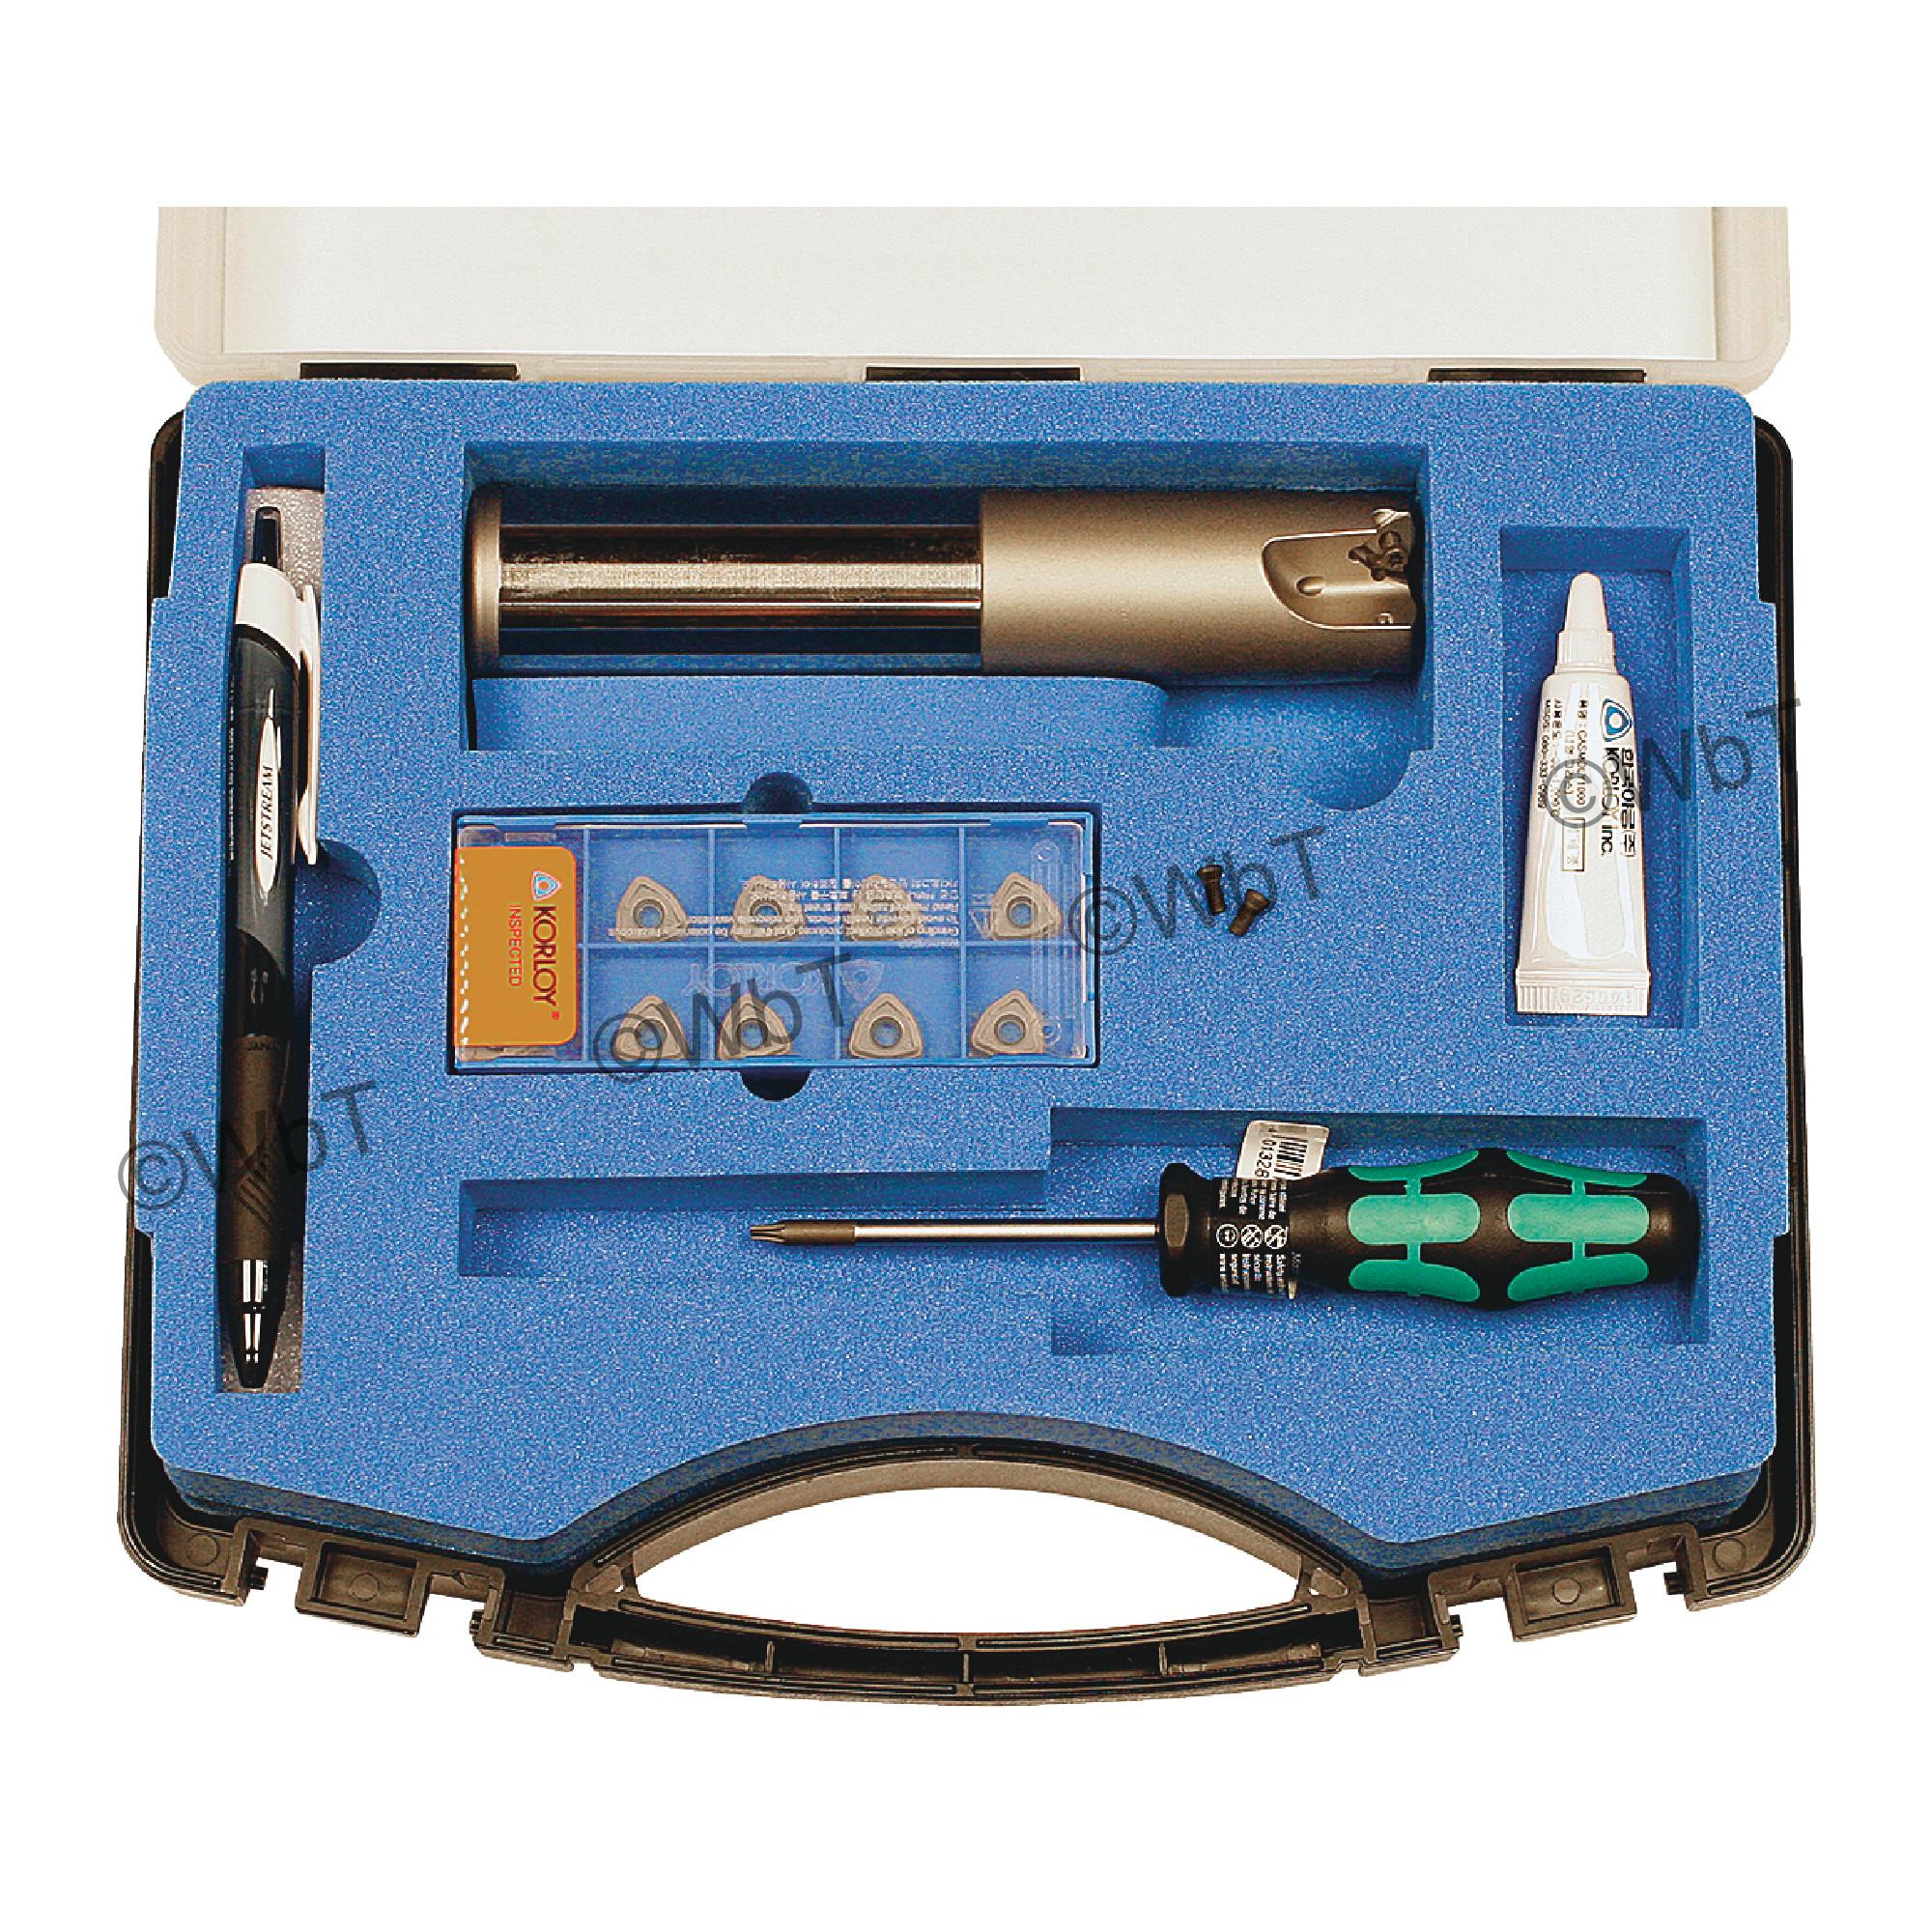 "KORLOY - 1.250"" High-Feed End Mill Set / Includes: (1) HRMDSA09125HR-3S125 (1.25"" ø) & (10) WNMX09T316ZNN-MM PC53"